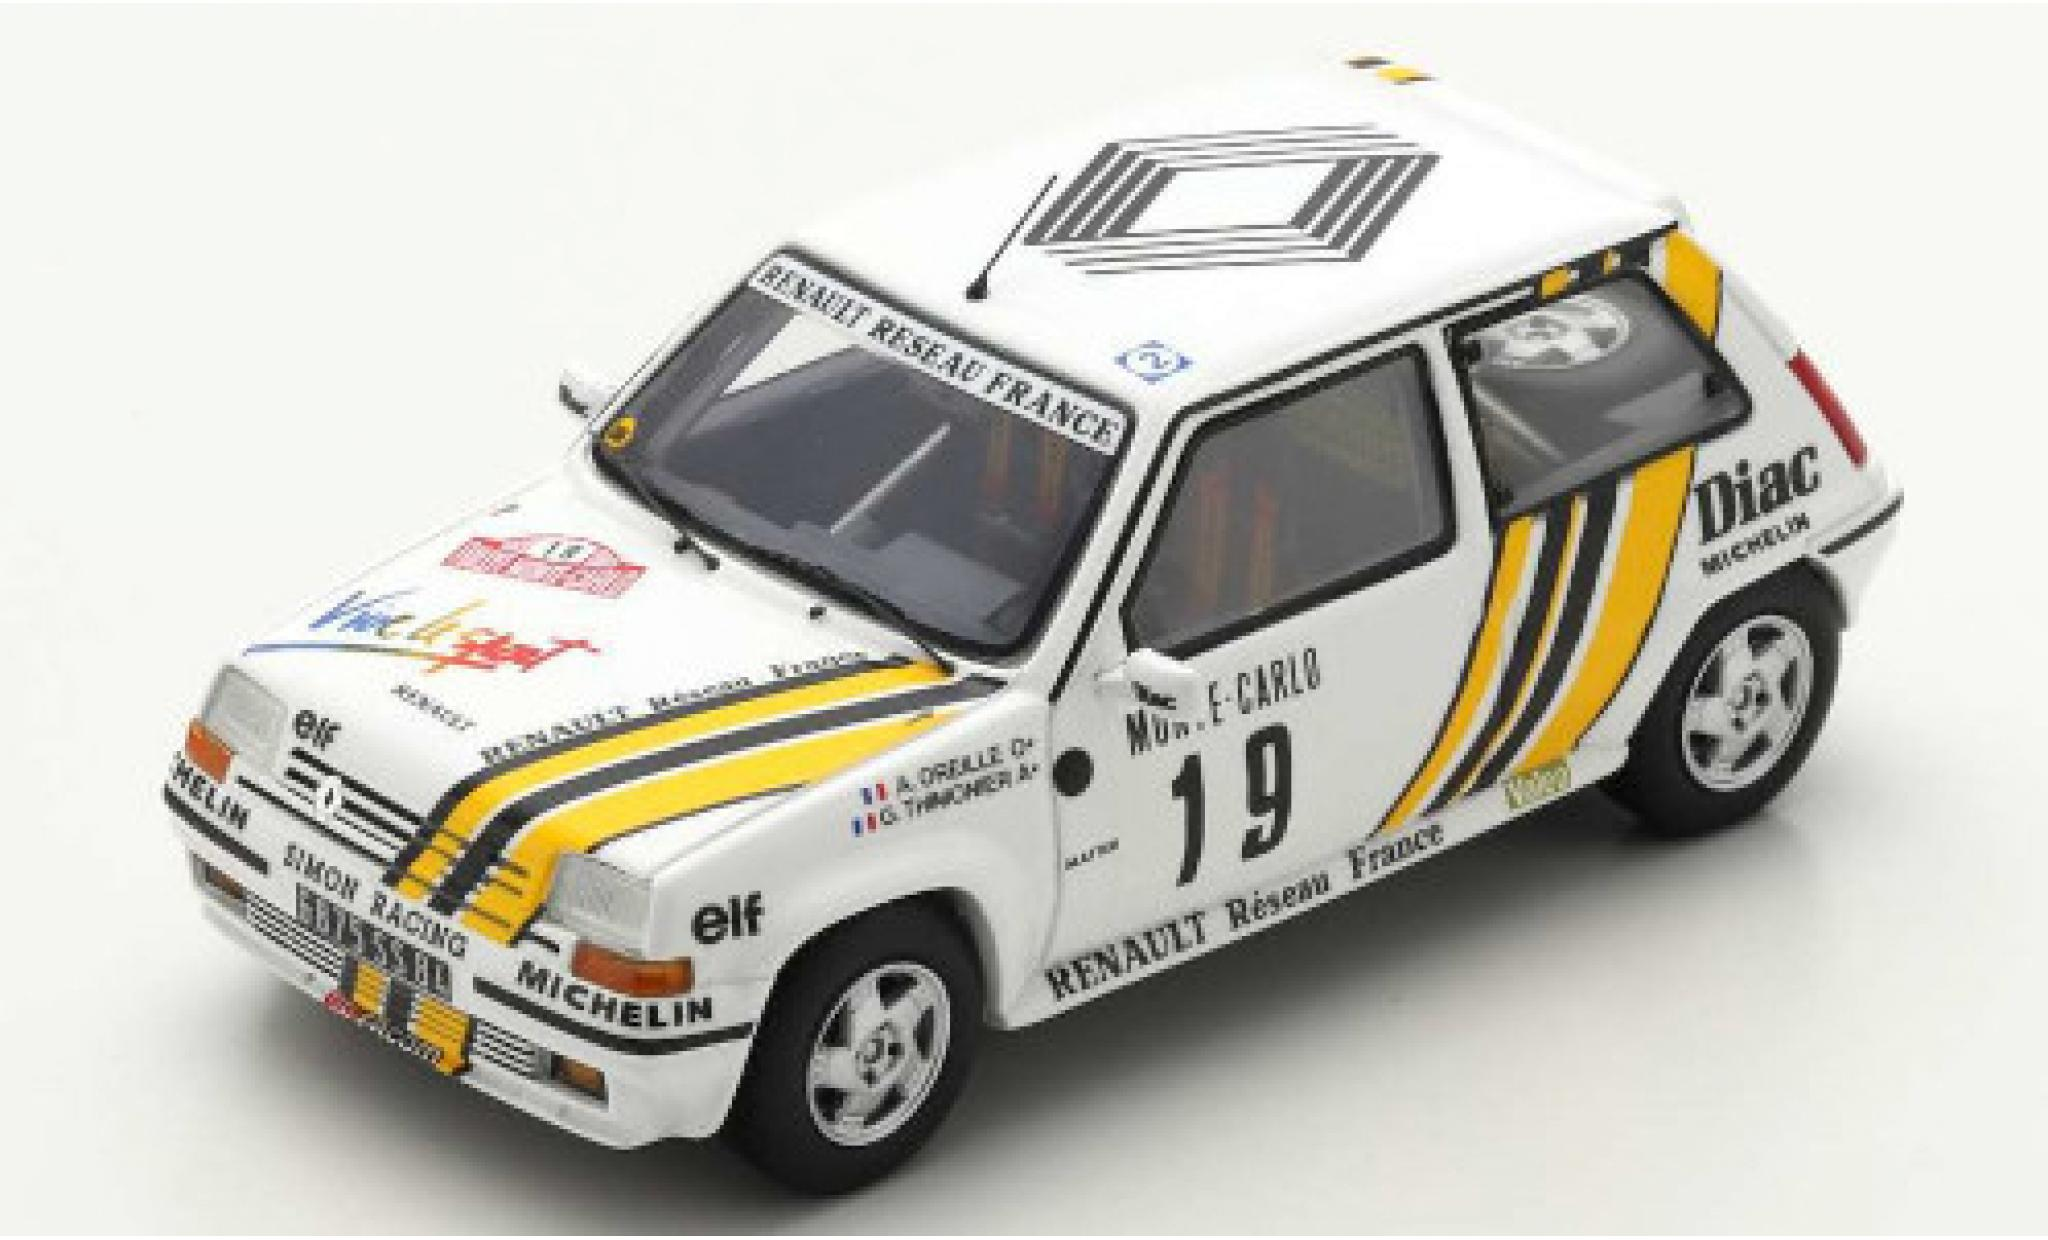 Renault 5 1/43 Spark GT Turbo No.19 Simon Racing Reseau France Rally Monte Carlo 1989 A.Oreille/G.Thimonier